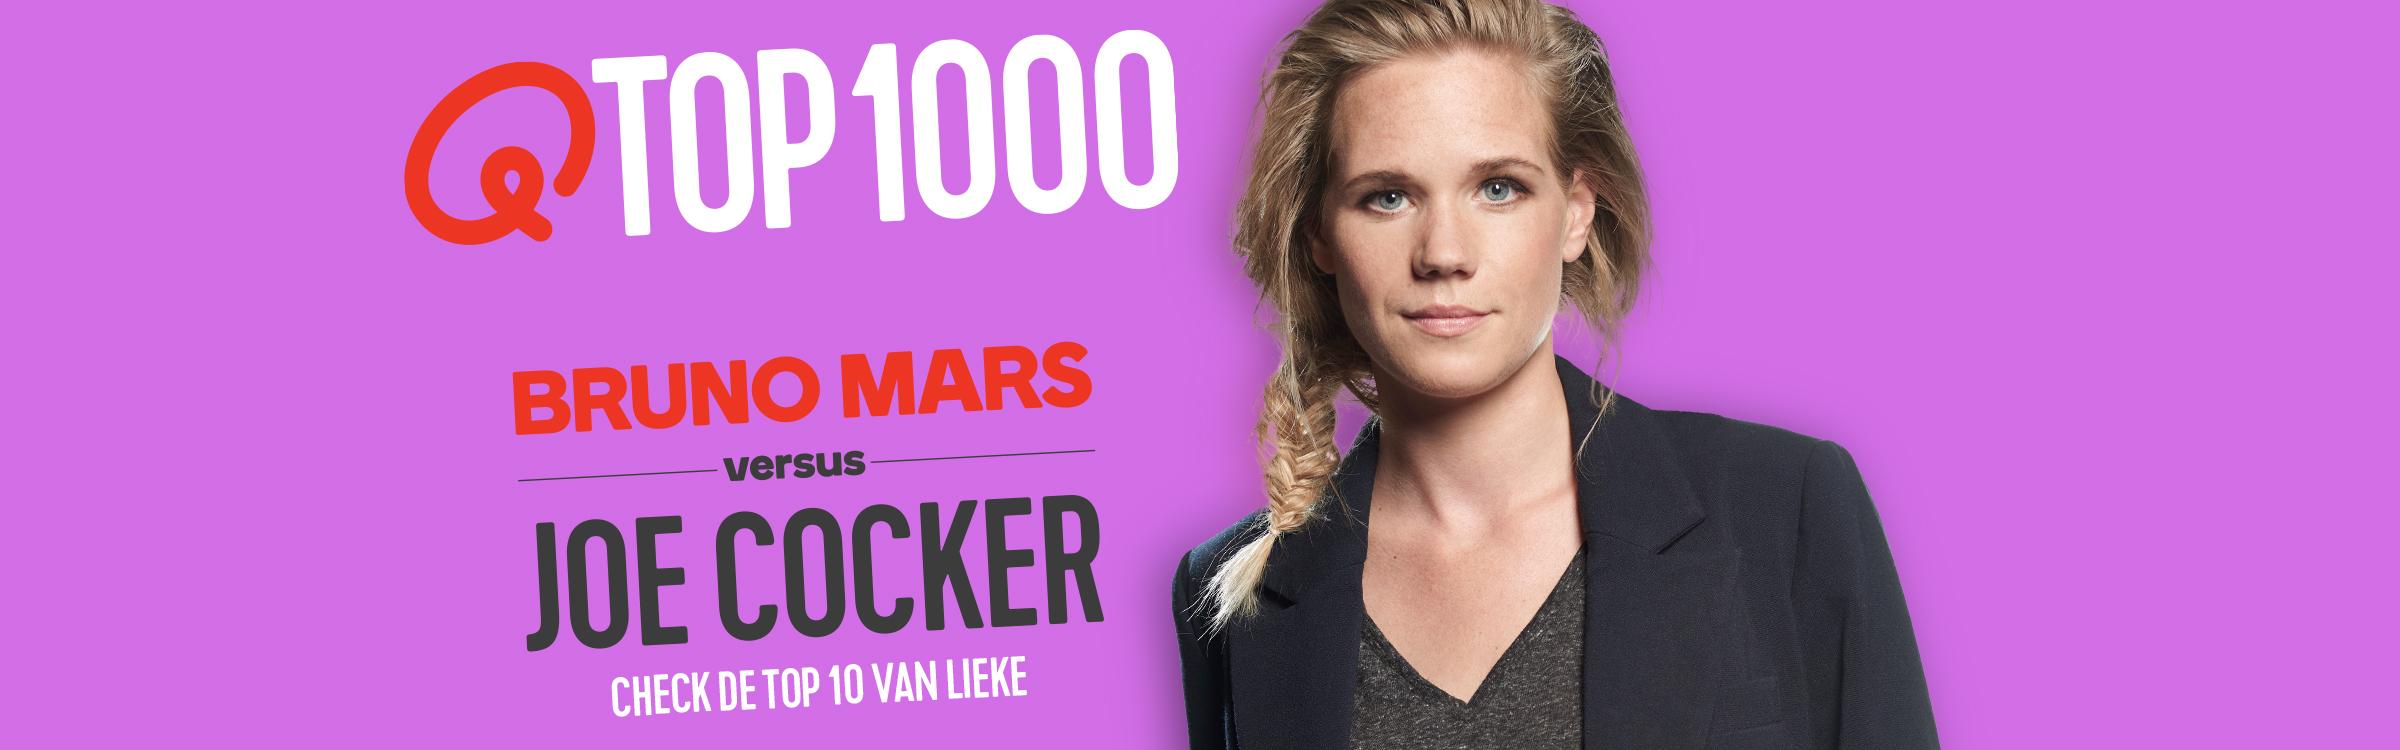 Qmusic actionheader top1000 djs lieke